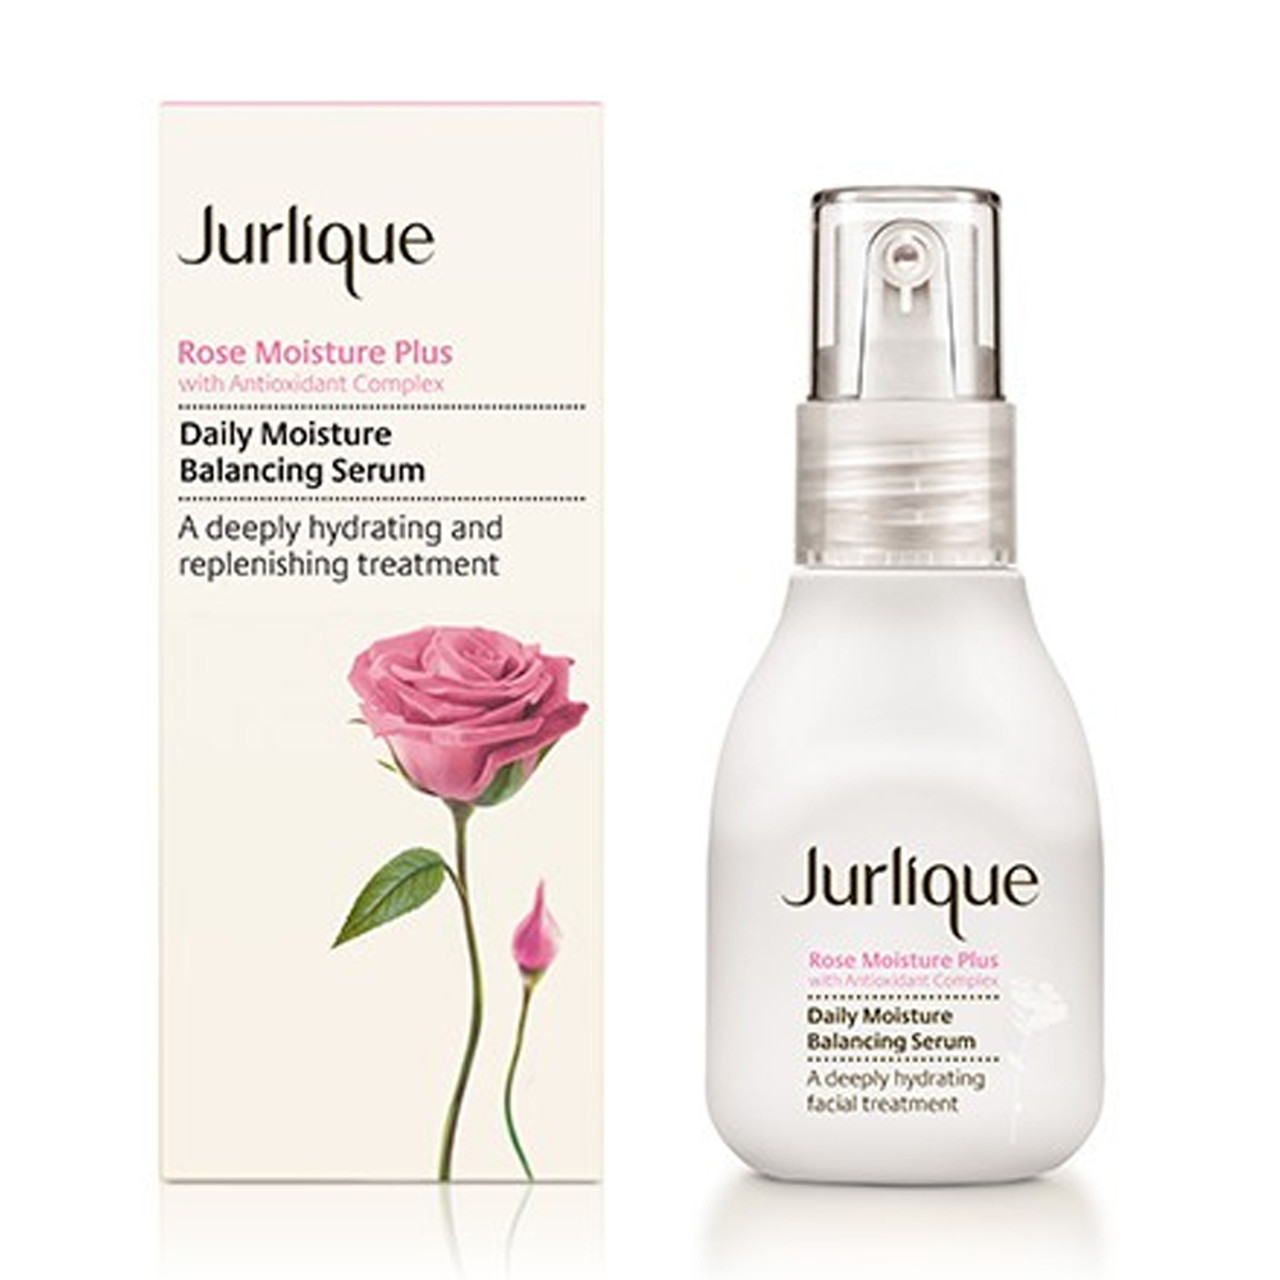 Jurlique Rose Moisture Plus Daily Moisture Balancing Serum(discontinued)